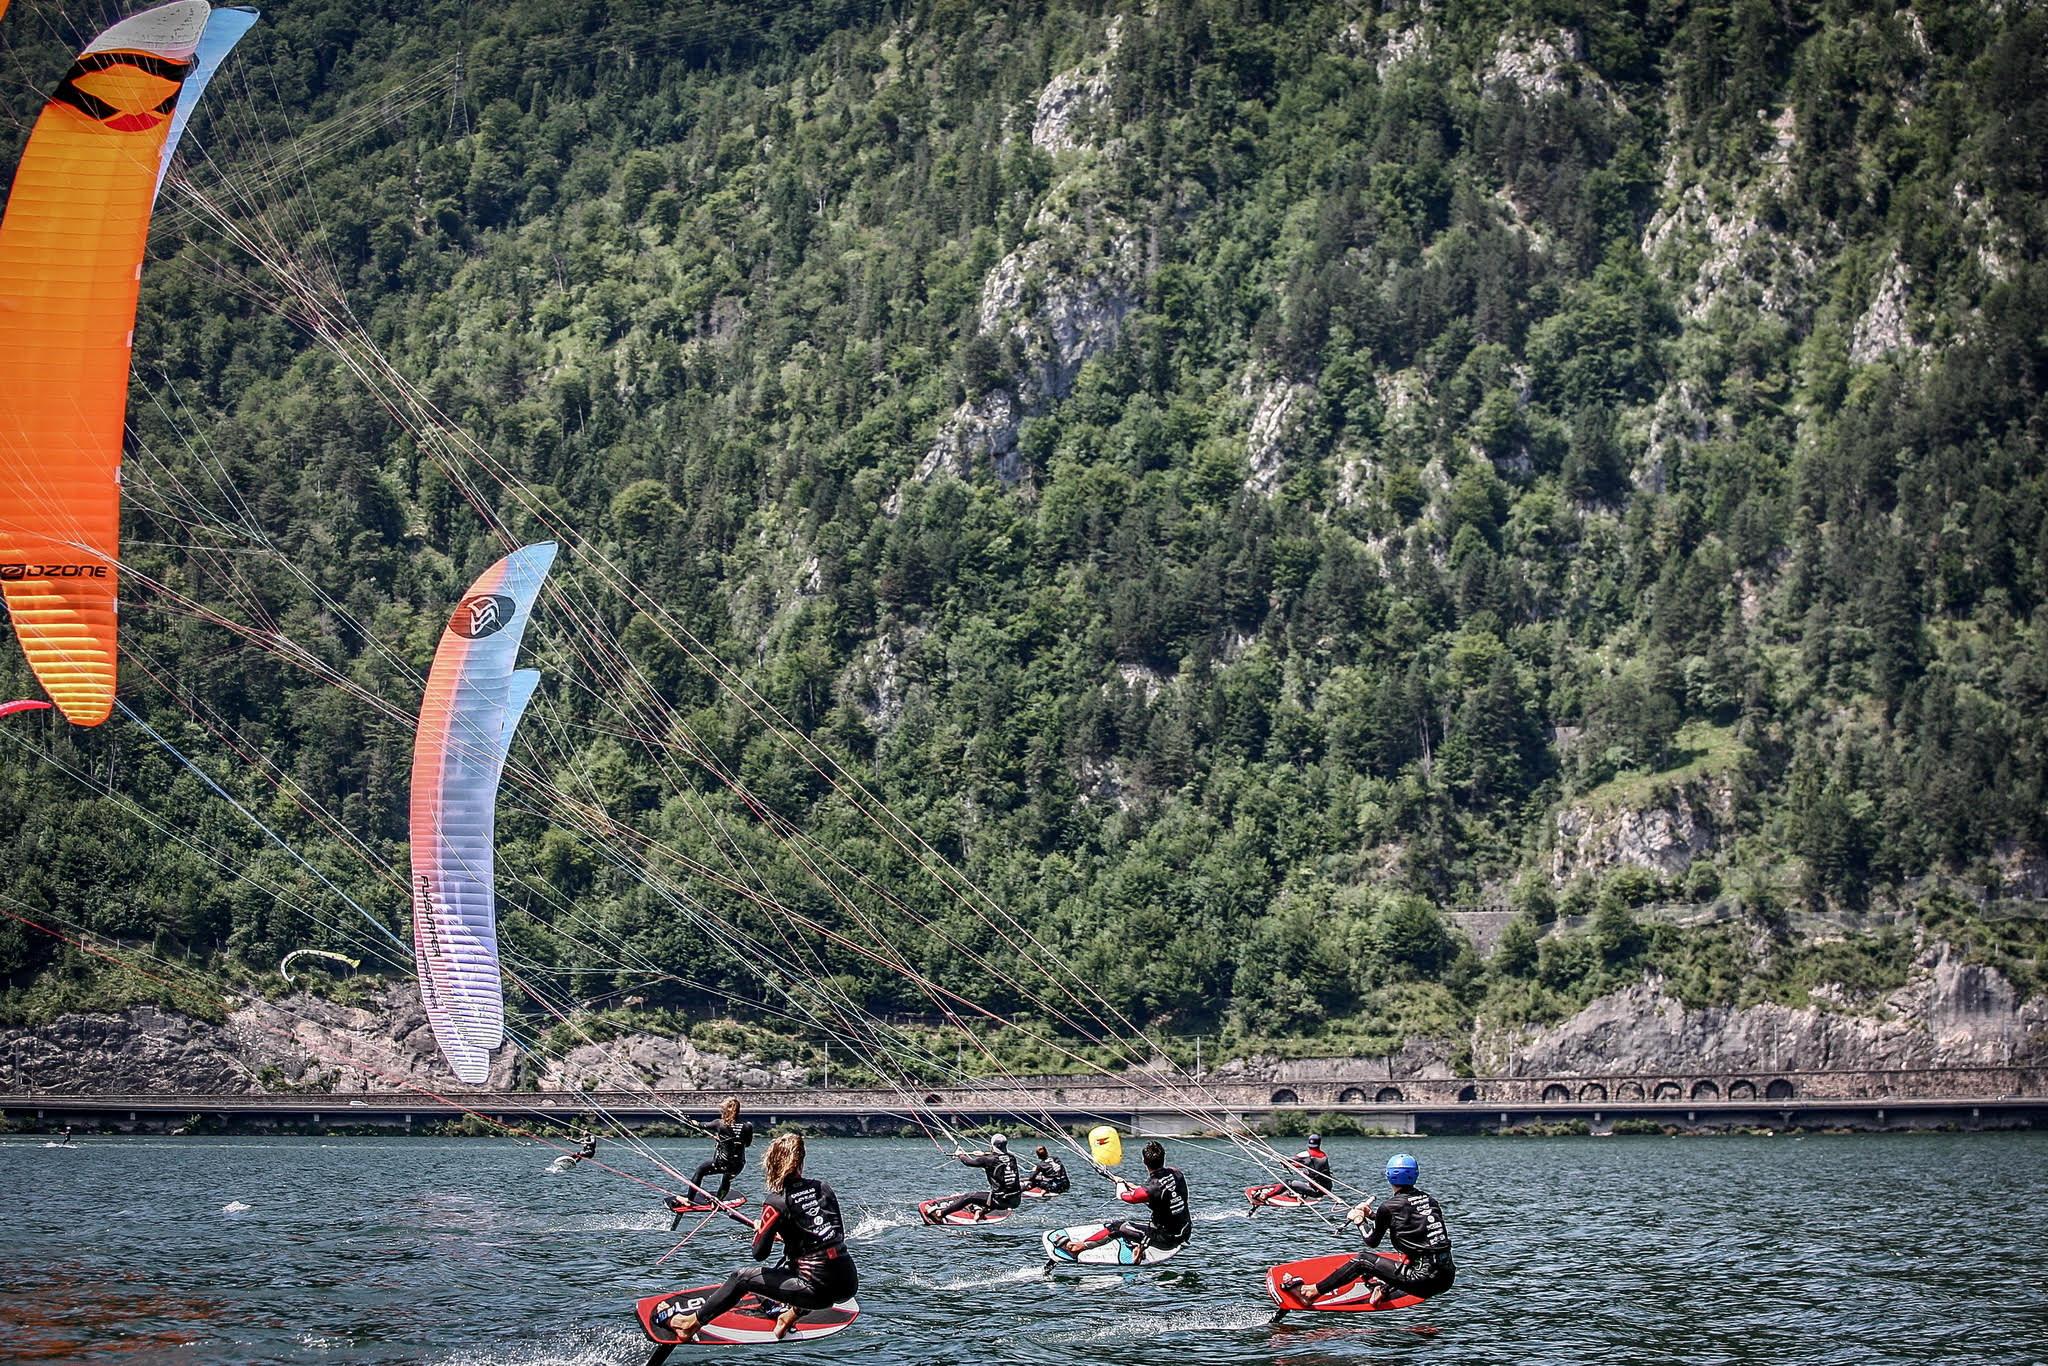 Austria hosts KiteFoil European Championship